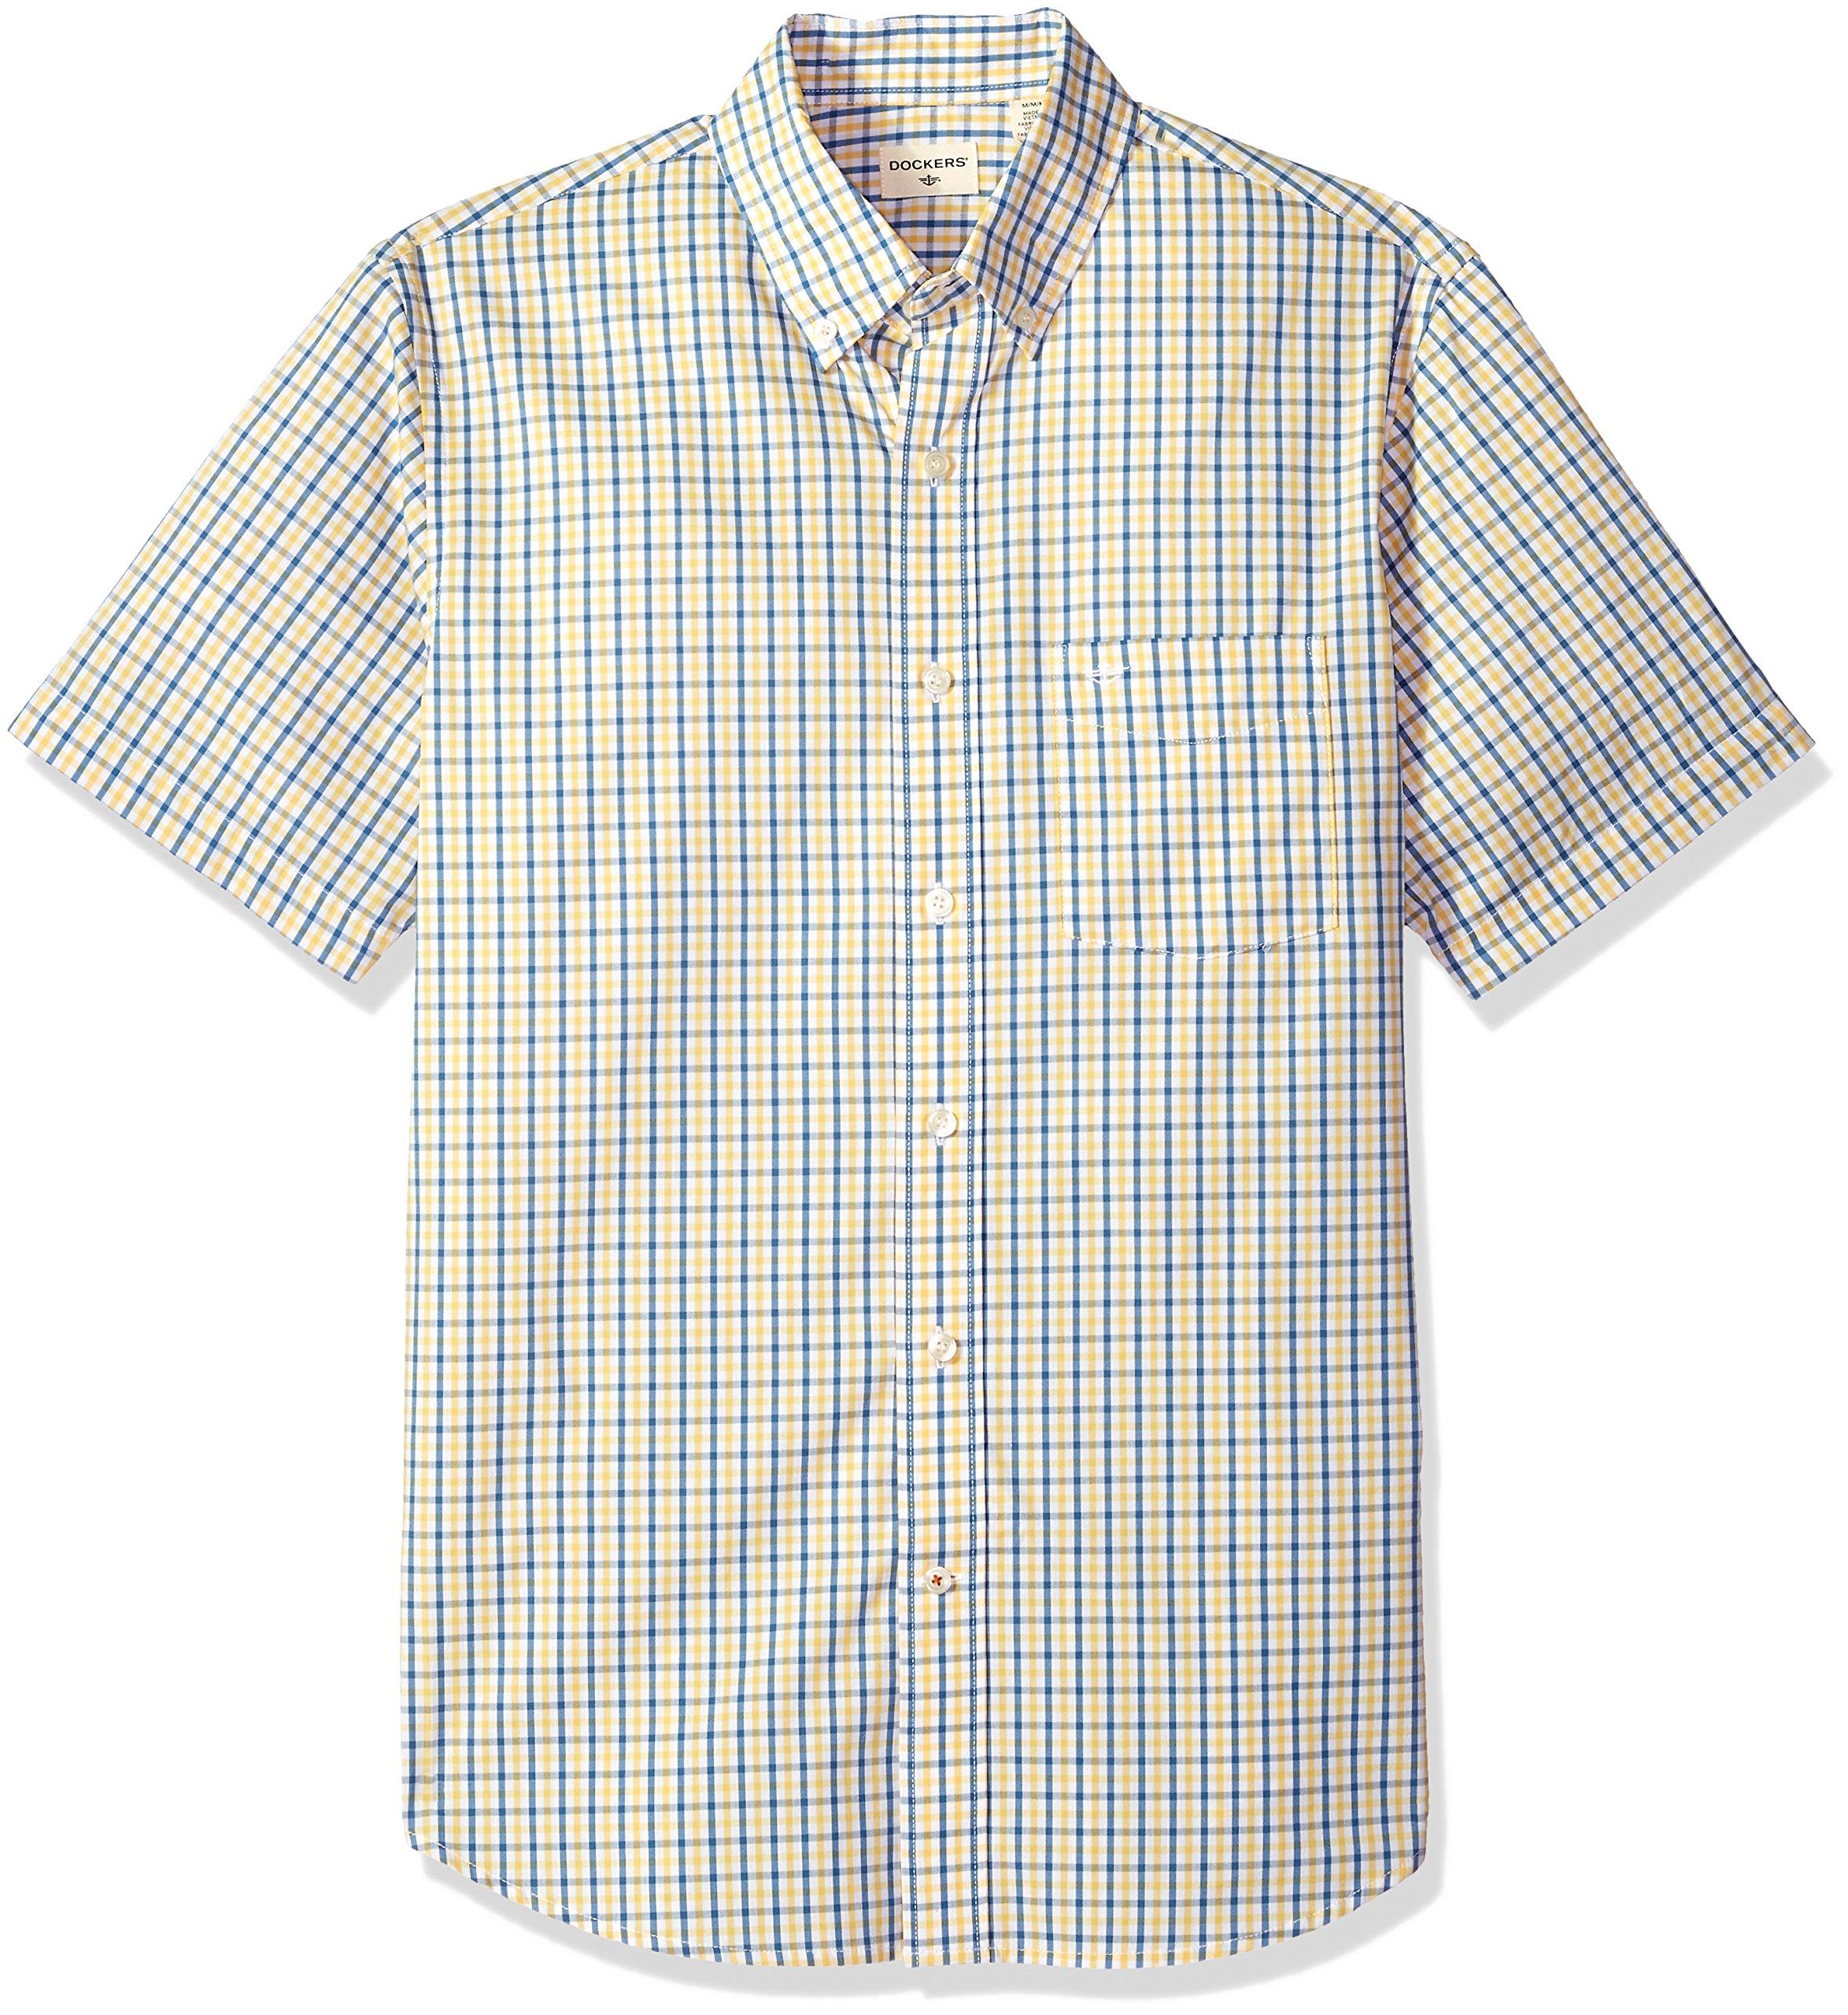 Dockers Men's Short Sleeve Button Down Comfort Flex Shirt, Mimosa Gingham 2X-Large